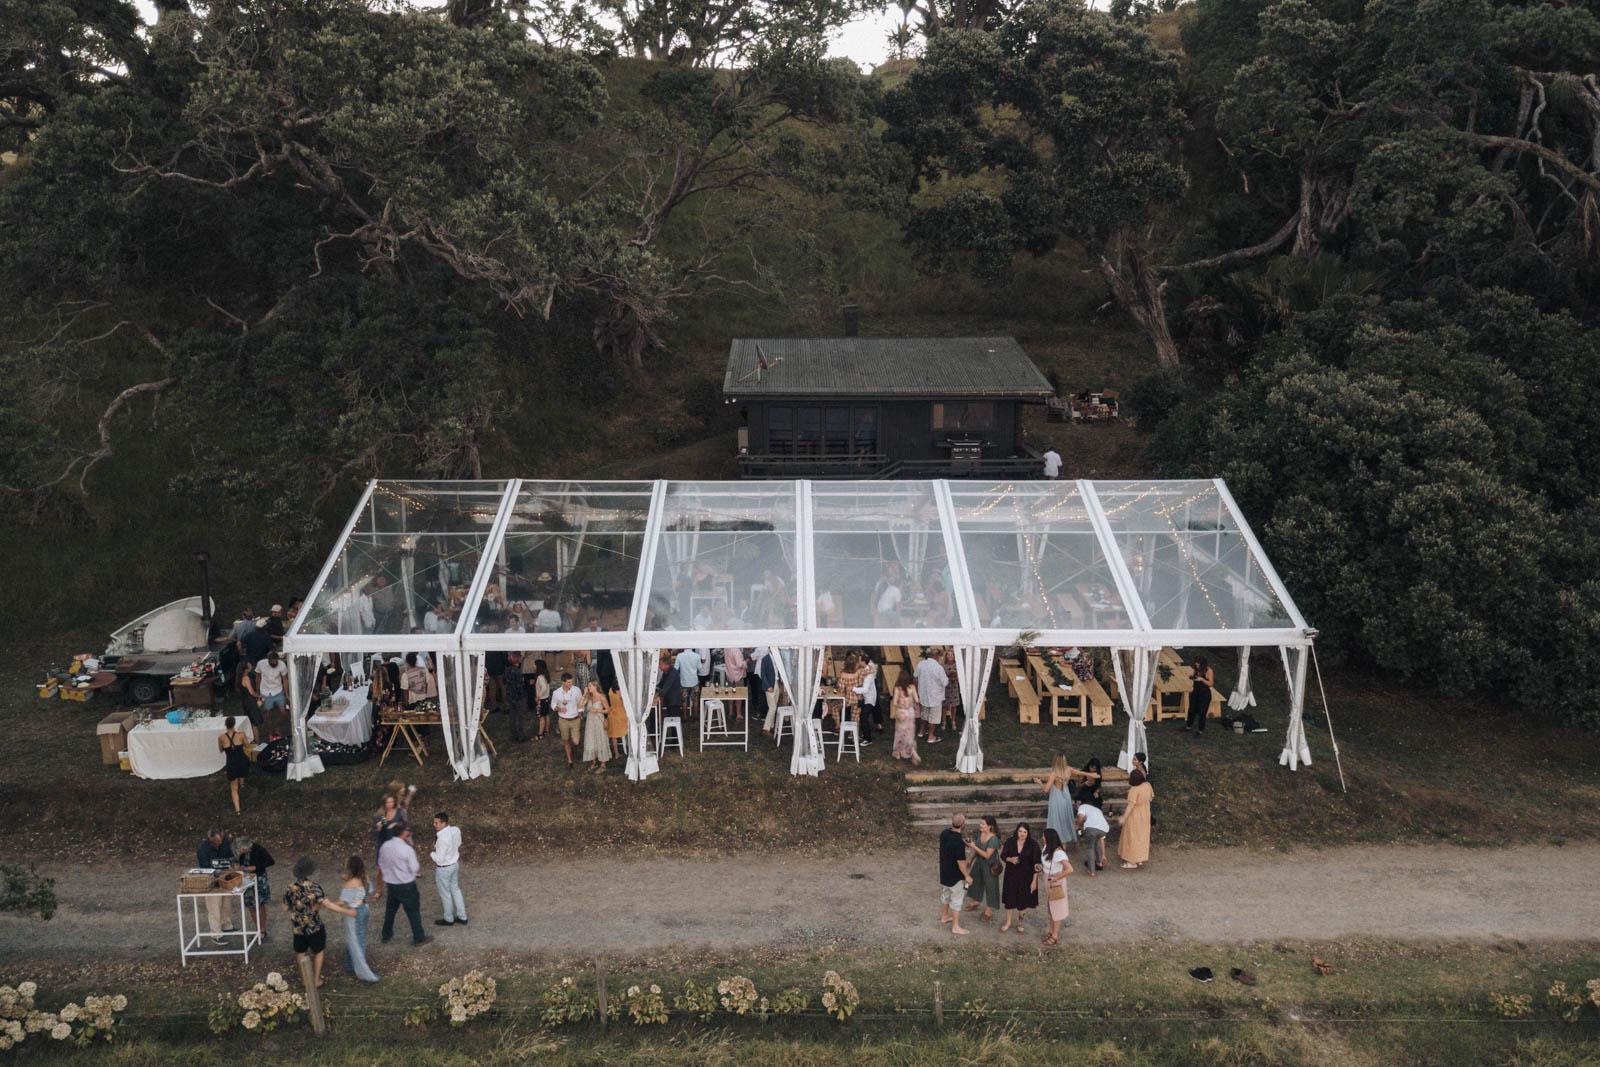 newfound-l-i-coromandel-wedding-photographer-2018-DJI_0108